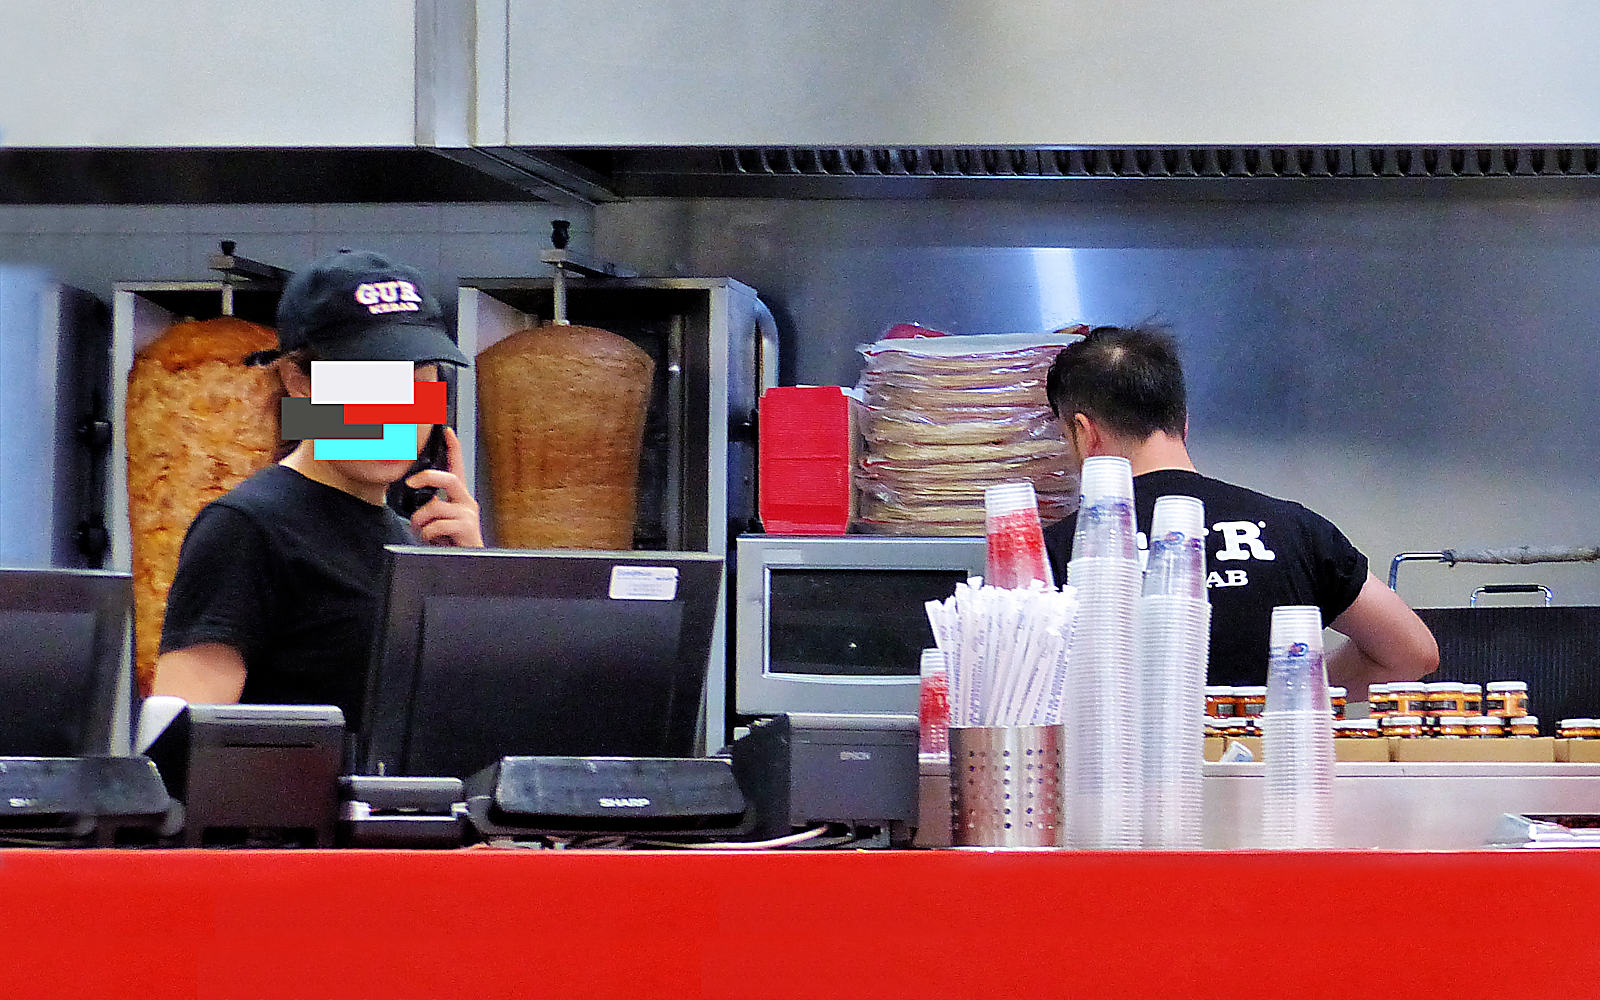 GUR Kebab Tourcoing - Broches